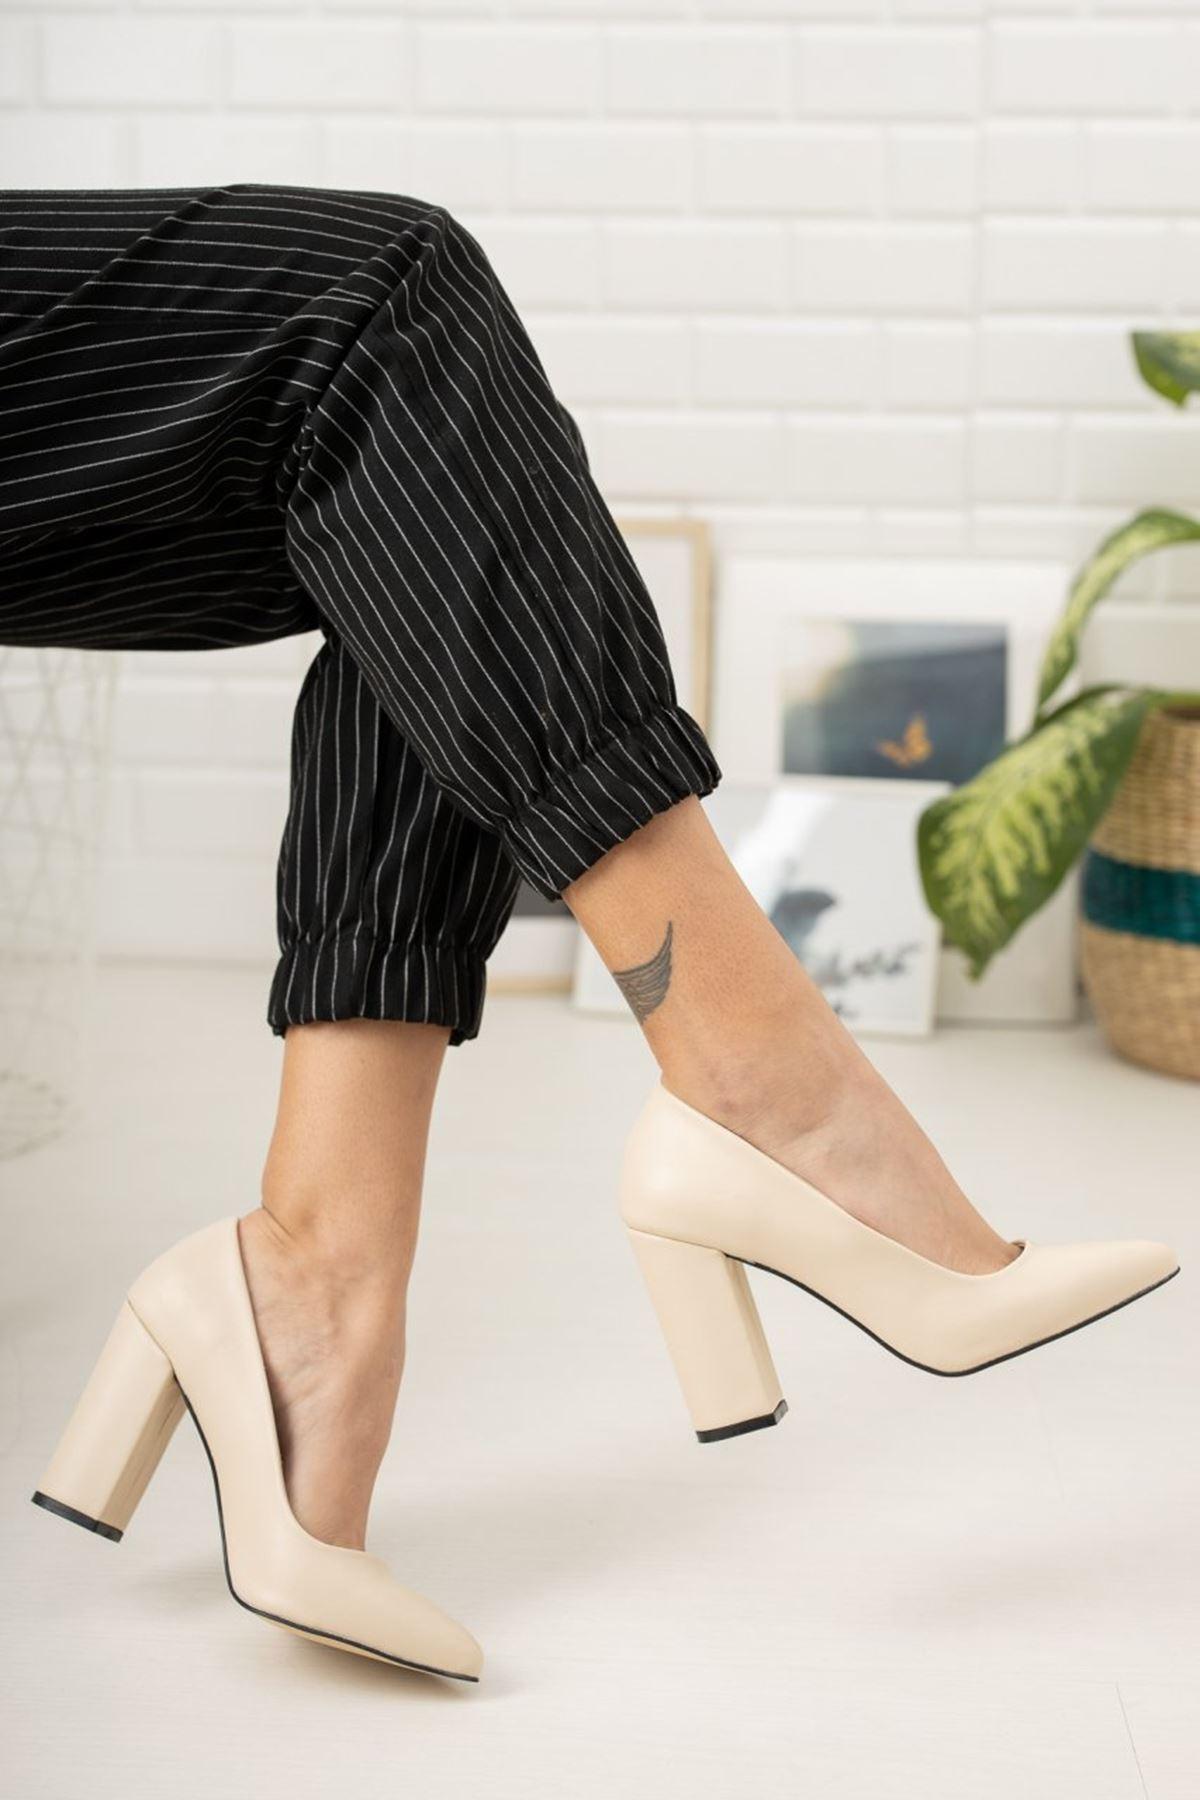 Kadın Kalvi Kalın Topuk Mat Deri Ten Stiletto